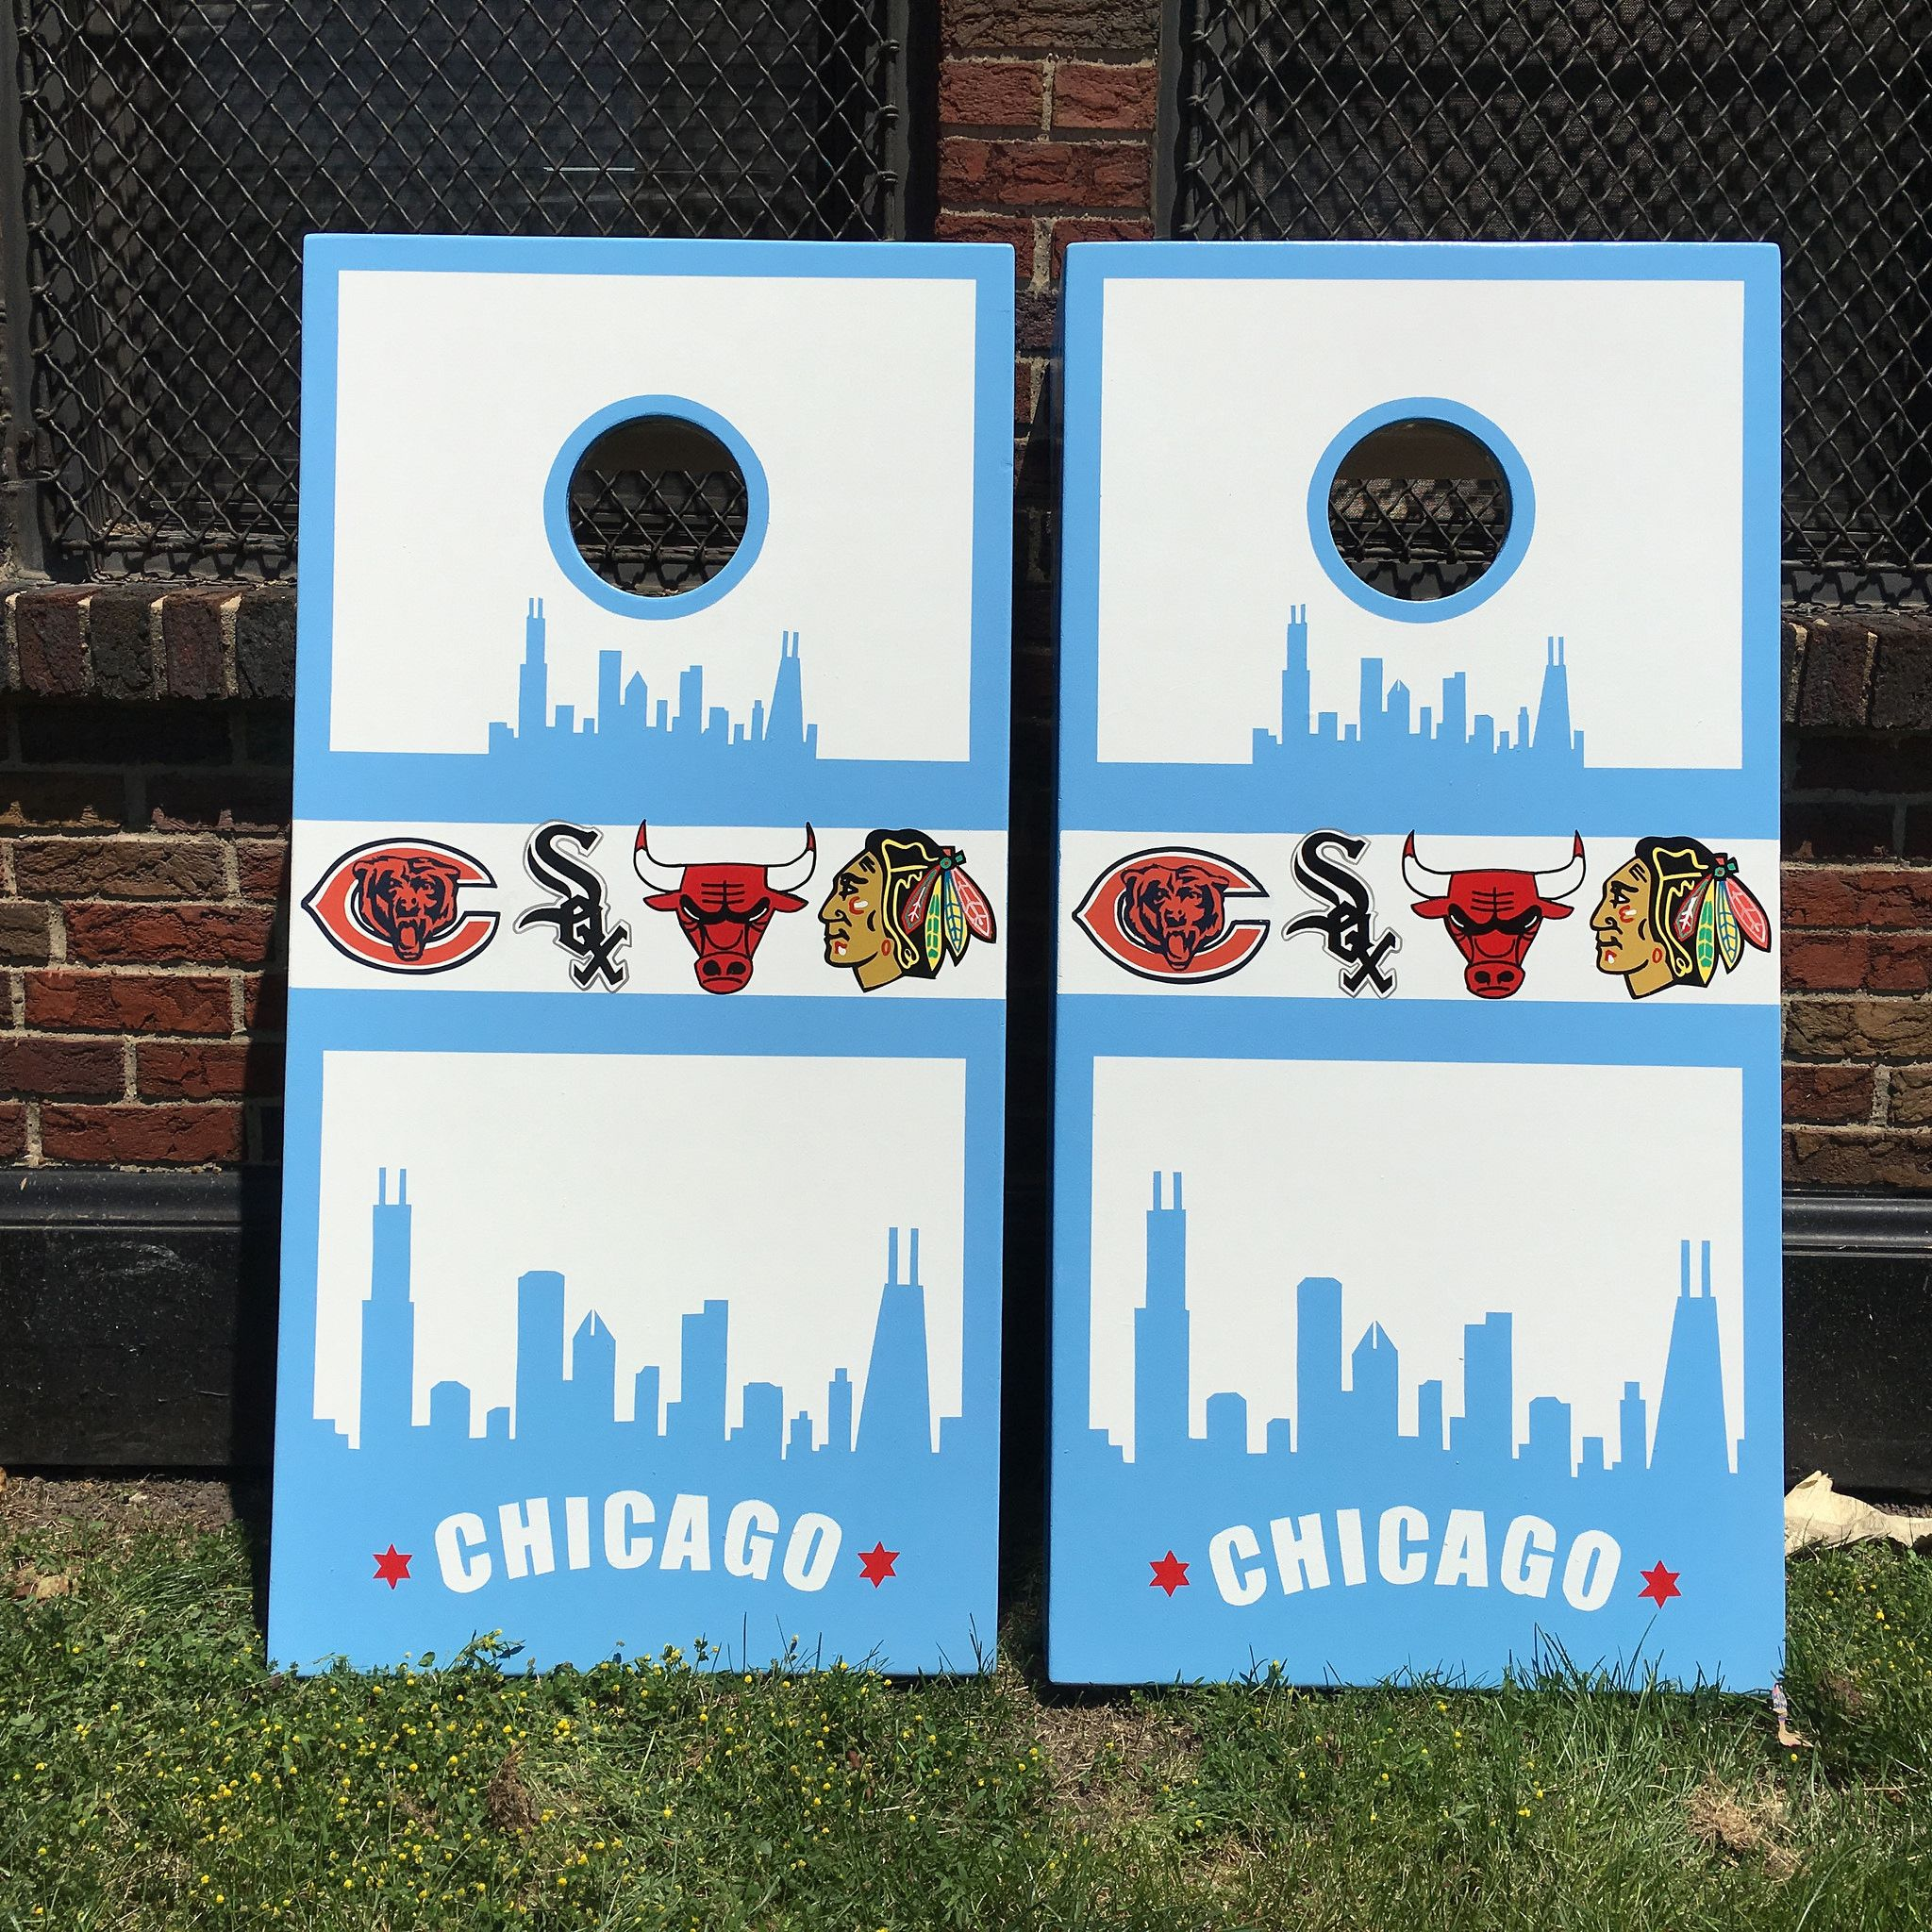 https://flic.kr/p/wppvuu | chicago bears, white sox, bulls, and